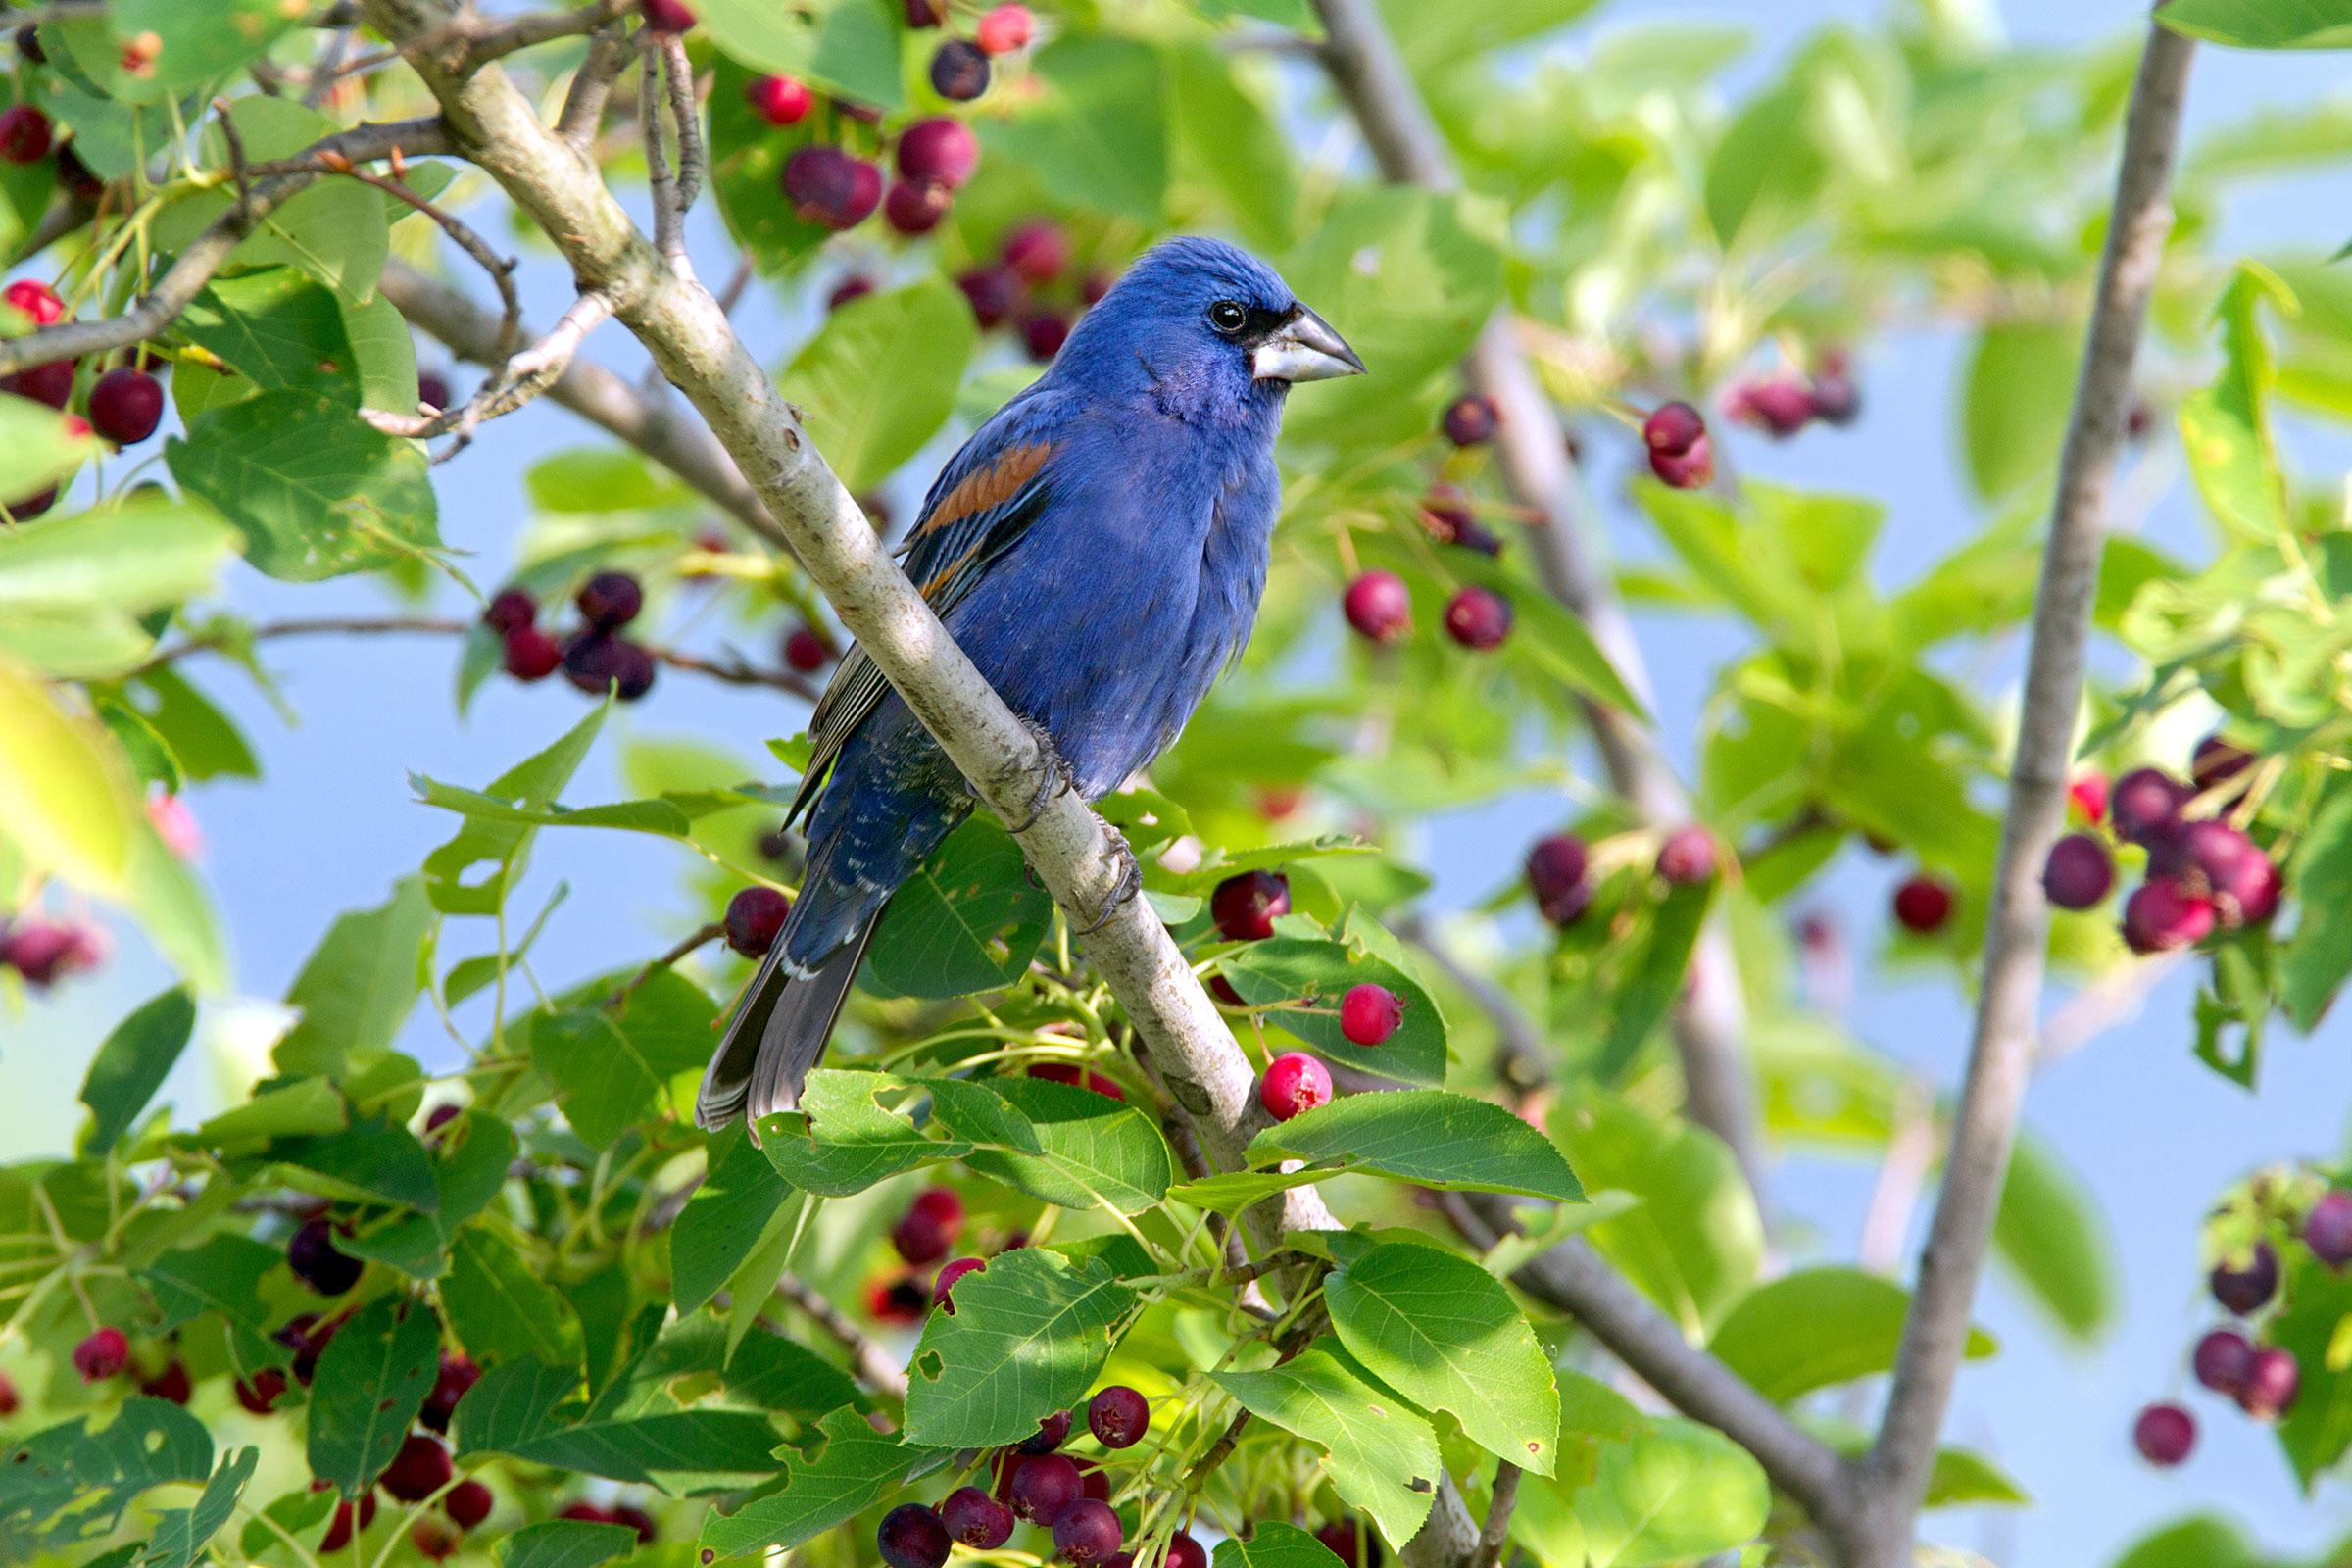 Blue Grosbeak in serviceberry. Dave Maslowski